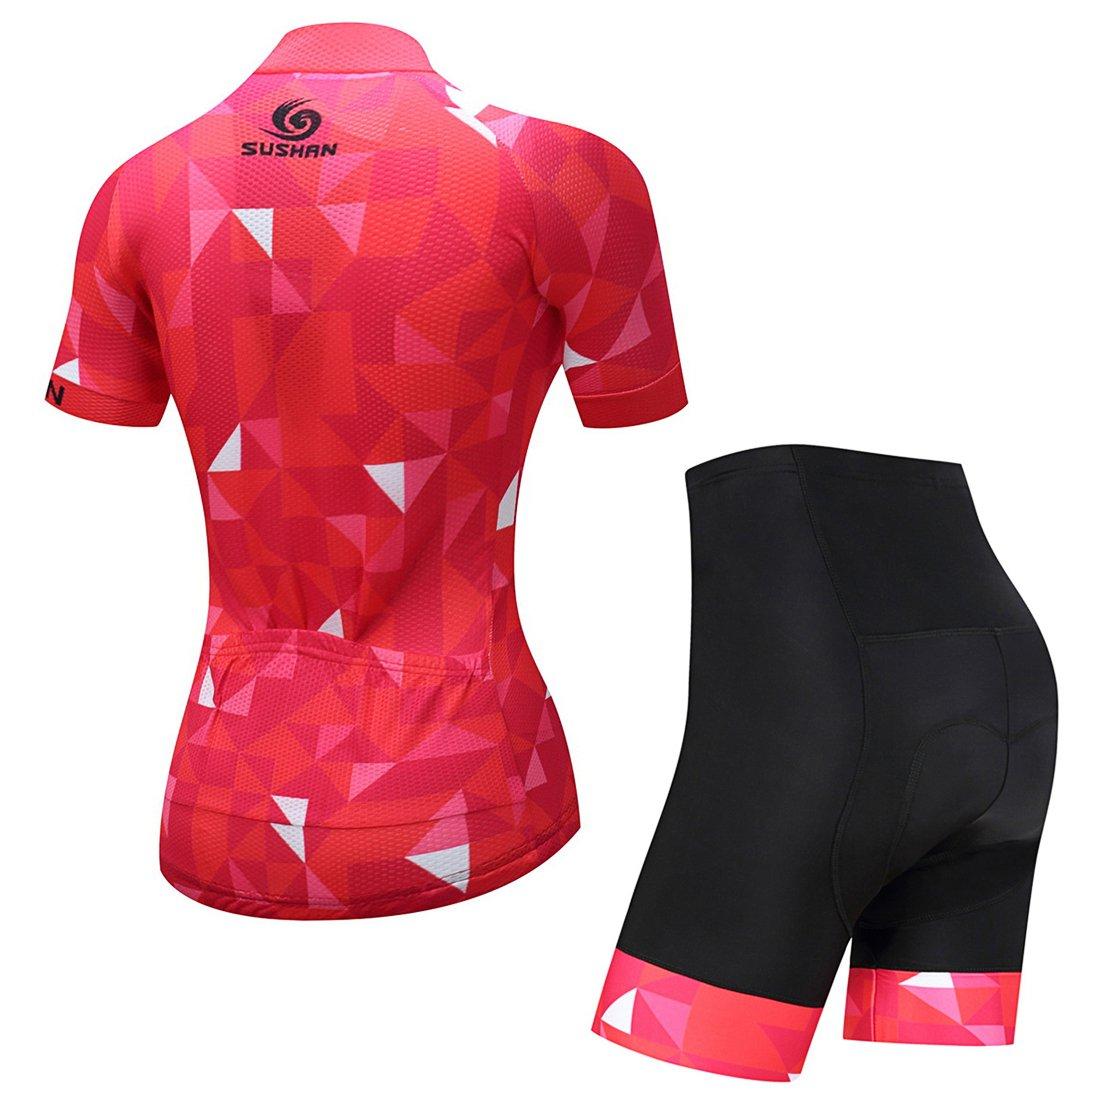 Culote Pantalones Acolchado 3D para Bicicleta Verano Deportes al Aire Libre GWELL Maillot Ciclismo Mujer Cclismo Conjunto de Ropa